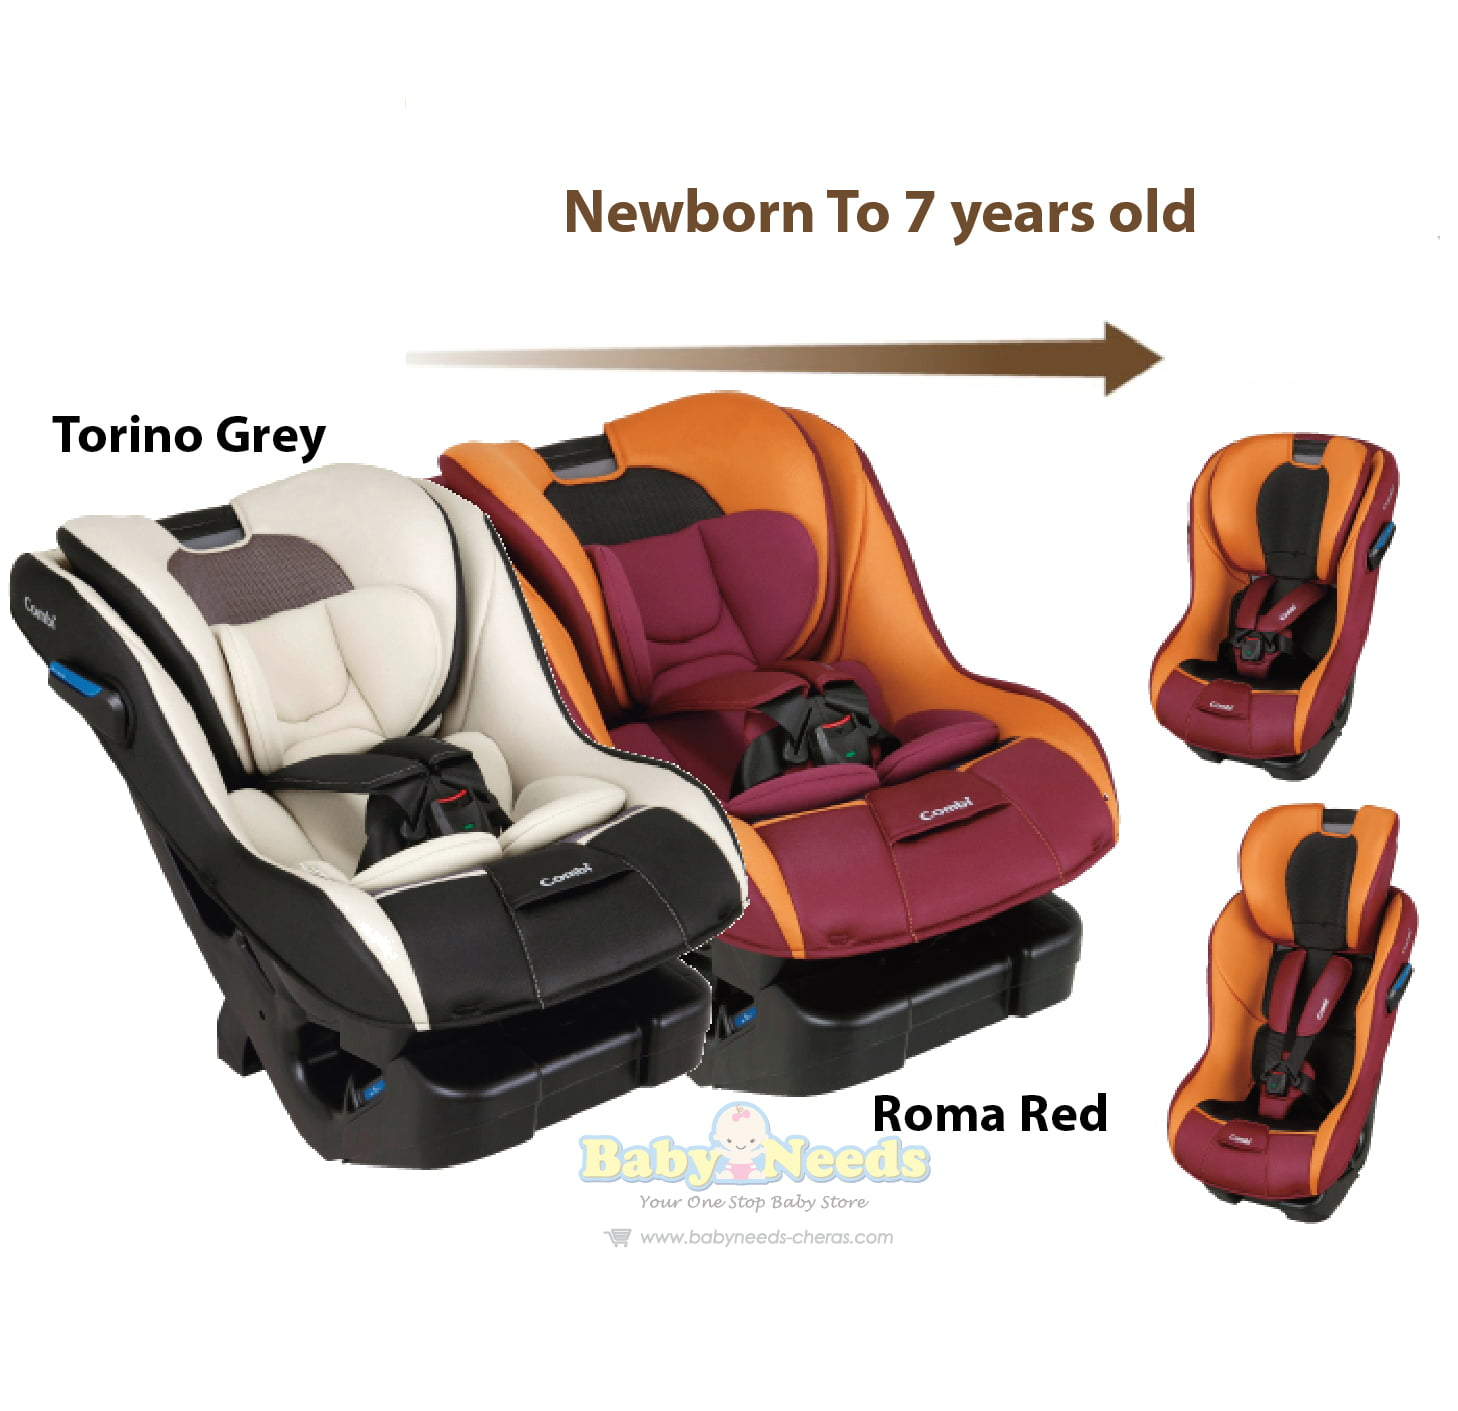 Combi Malgott S Convertible Car Seat Baby Needs Online Malaysia